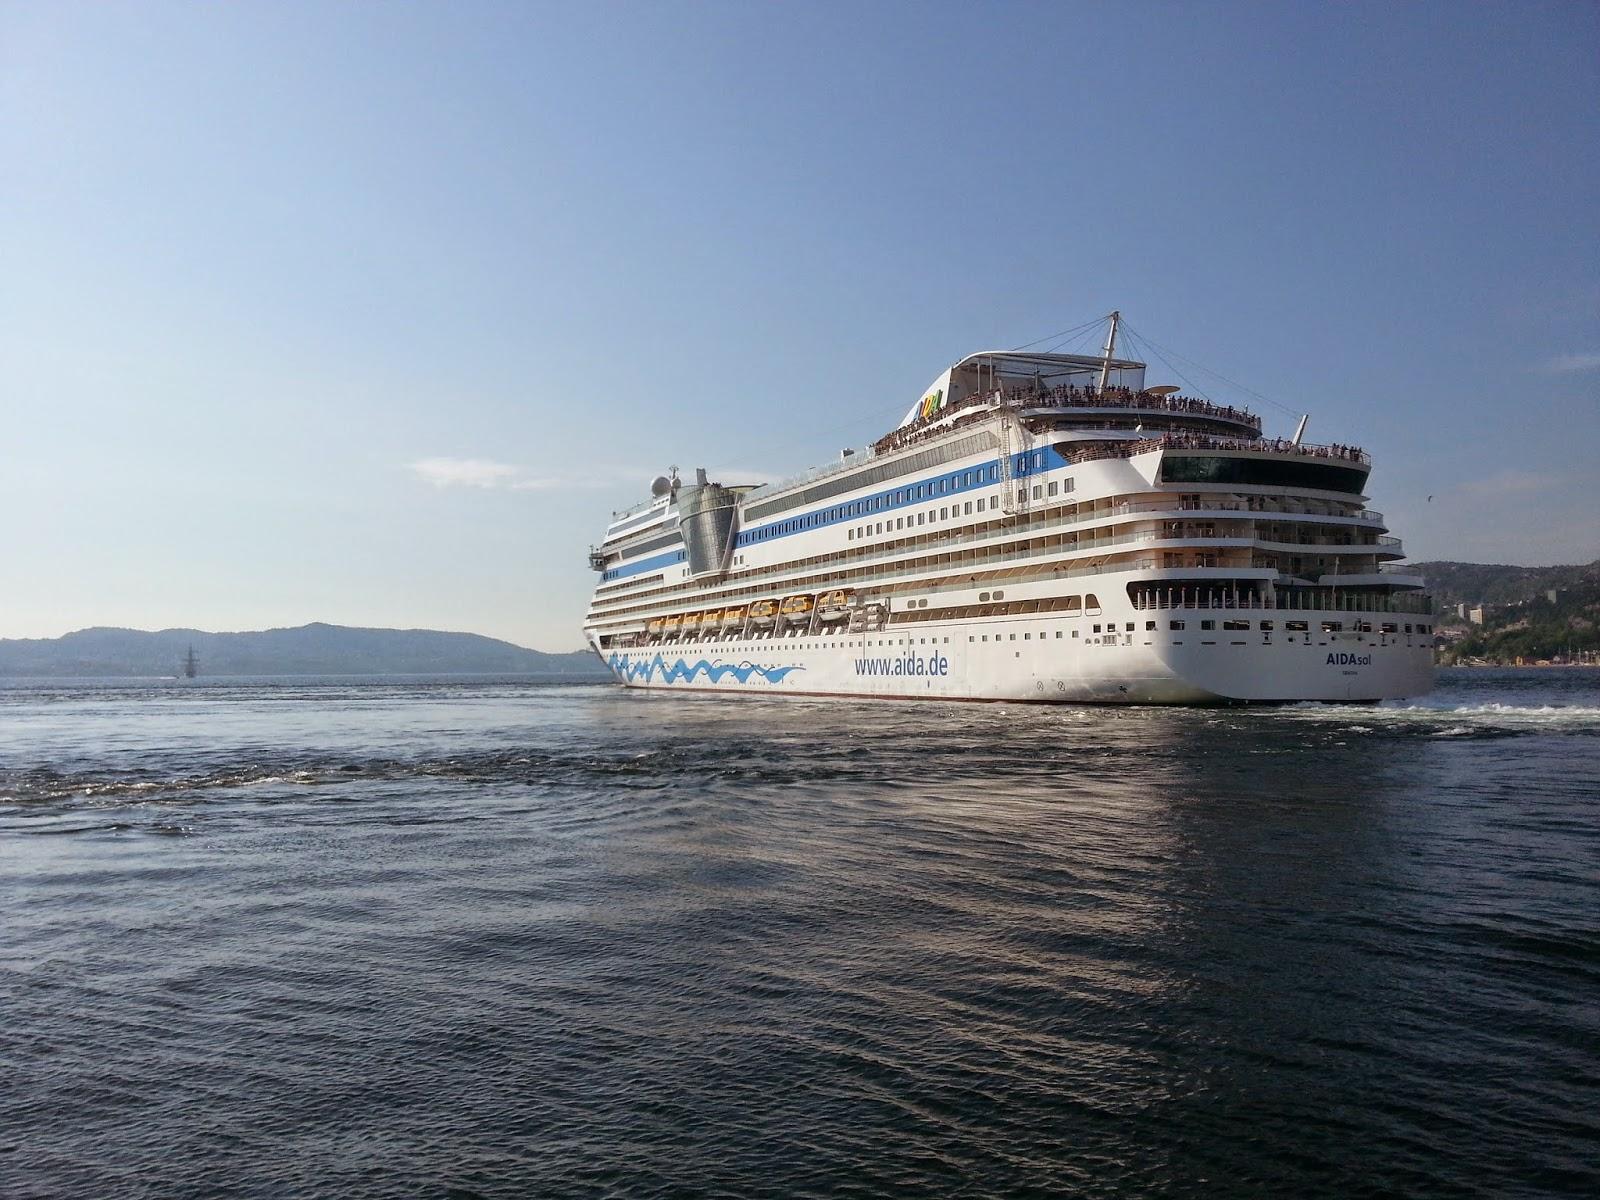 Cruise Ship AIDAsol in Bergen, Norway